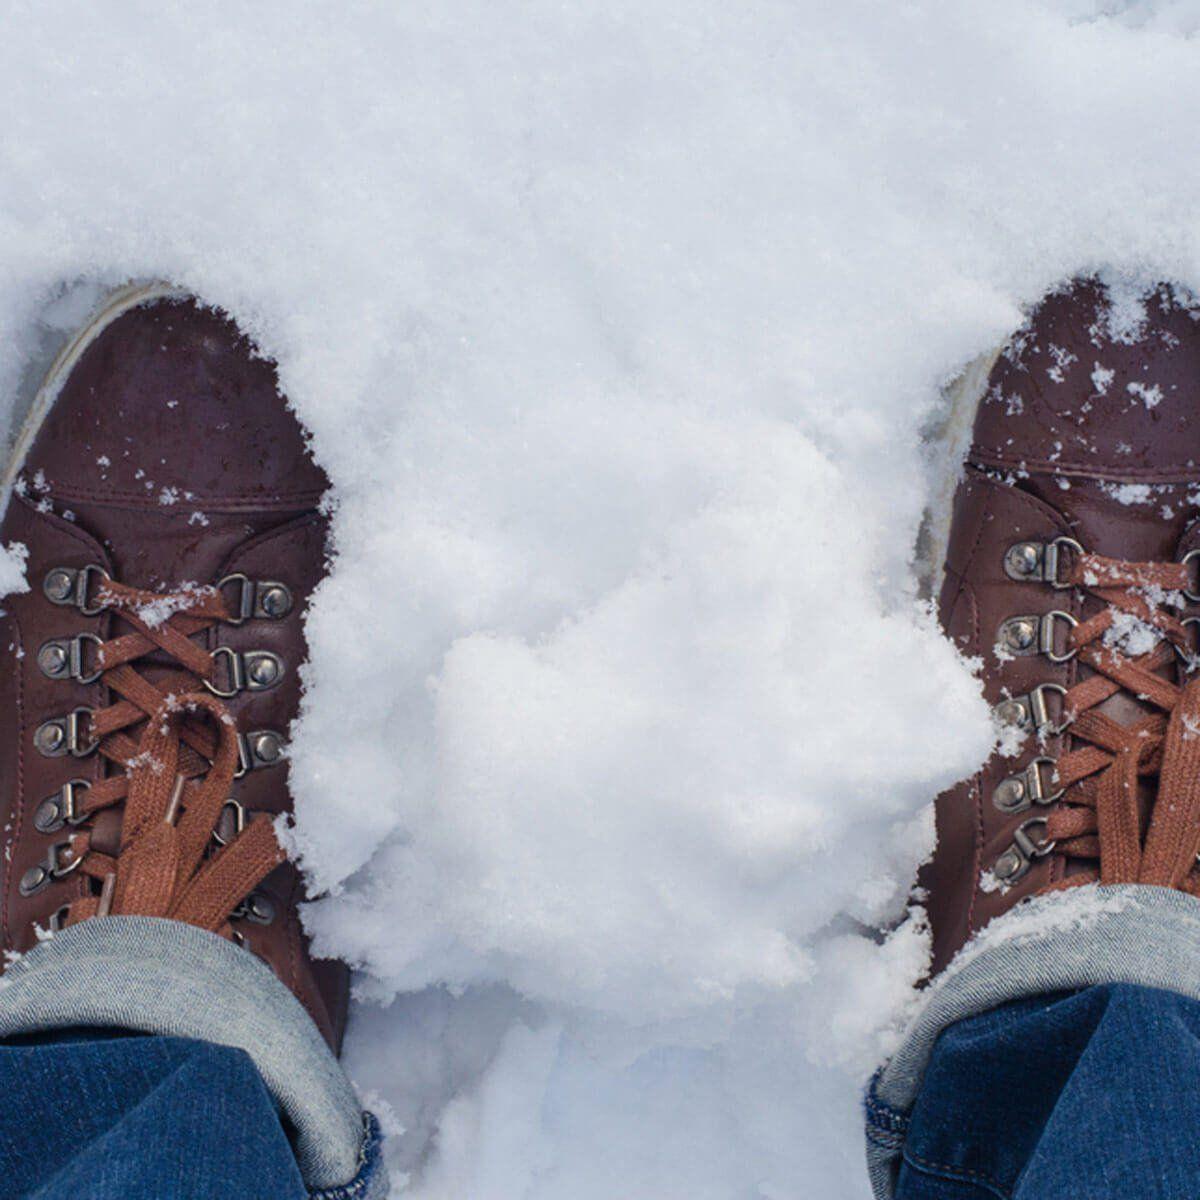 WTD-40 boots